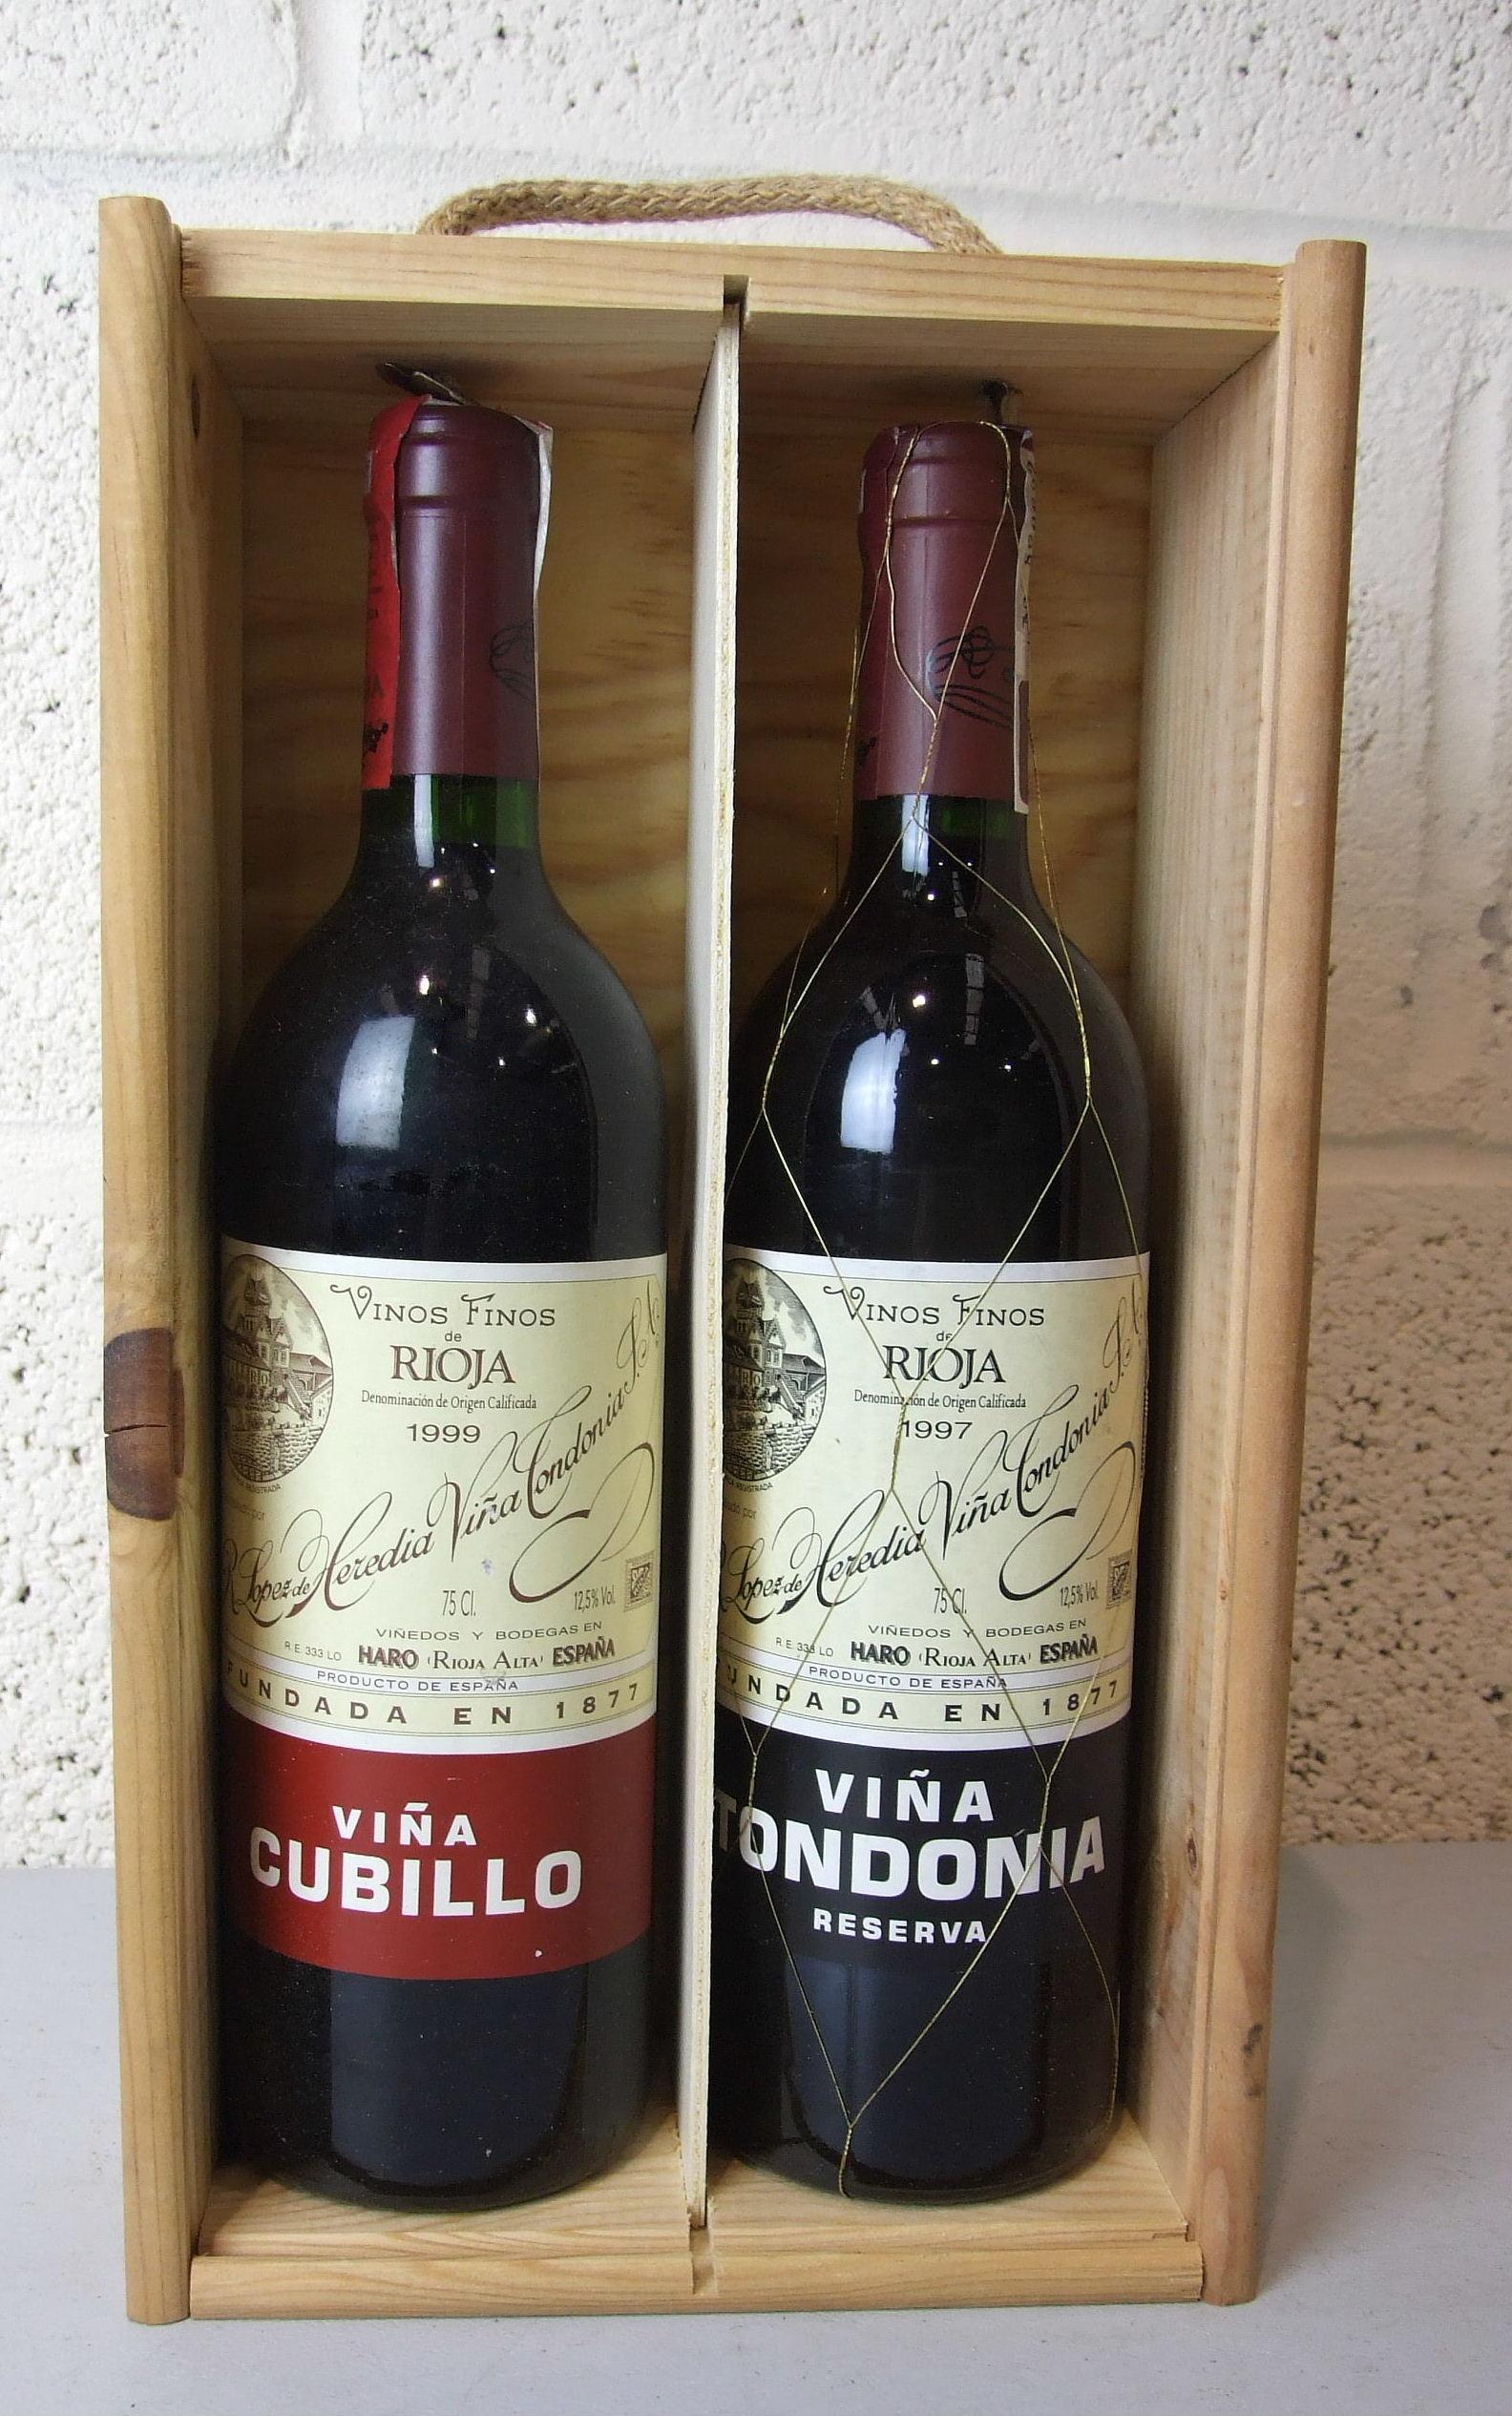 Lot 30 - Spain, Rioja Viña Cubillo 1999, one bottle and Viña Tondonia 1997, one bottle, (2).